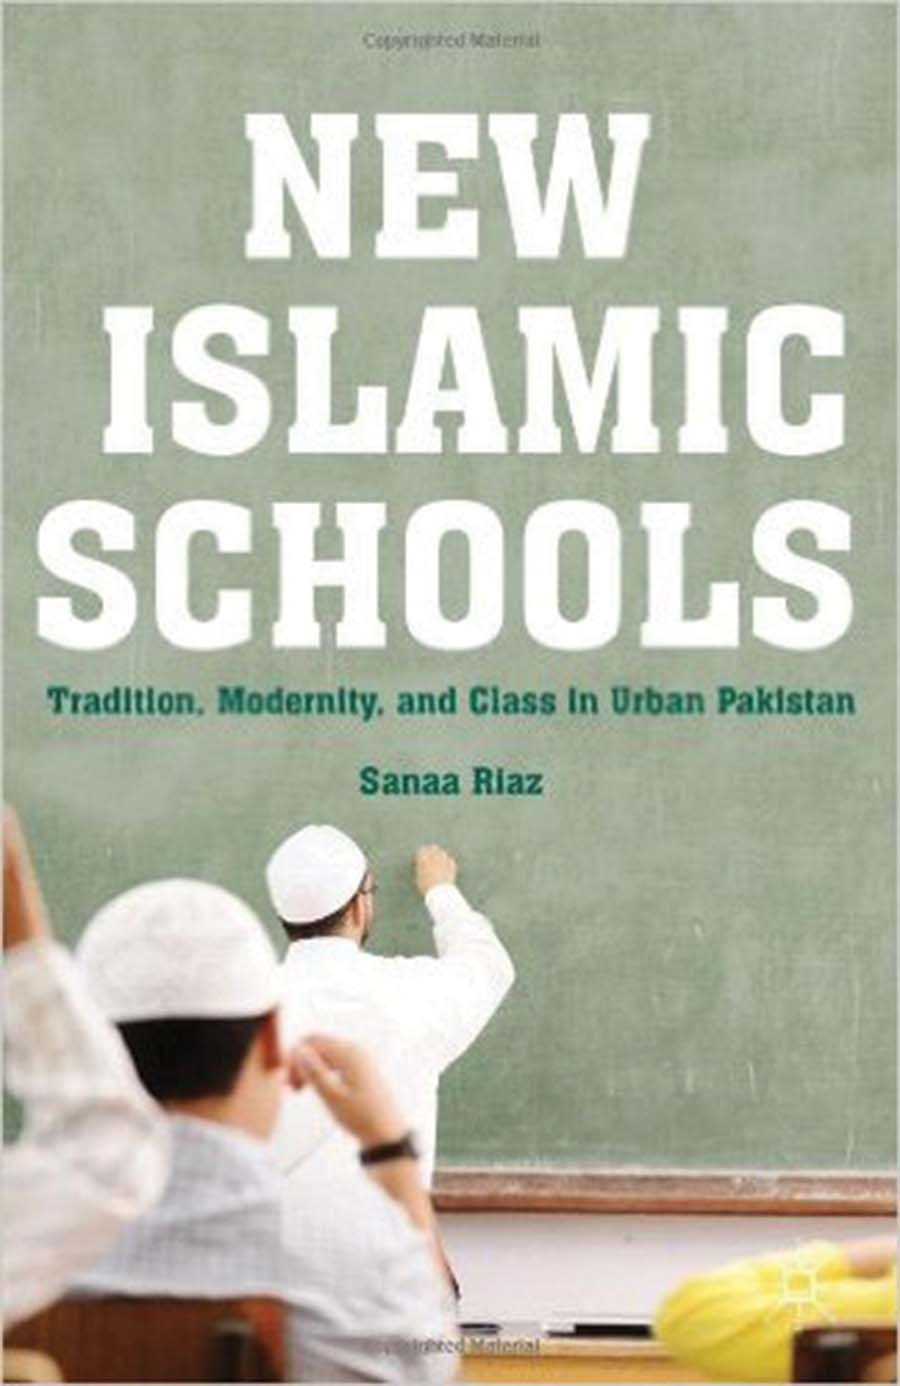 New Islamic Schools: Tradition, Modernity, and Class in Urban Pakistan  By Sanaa Riaz